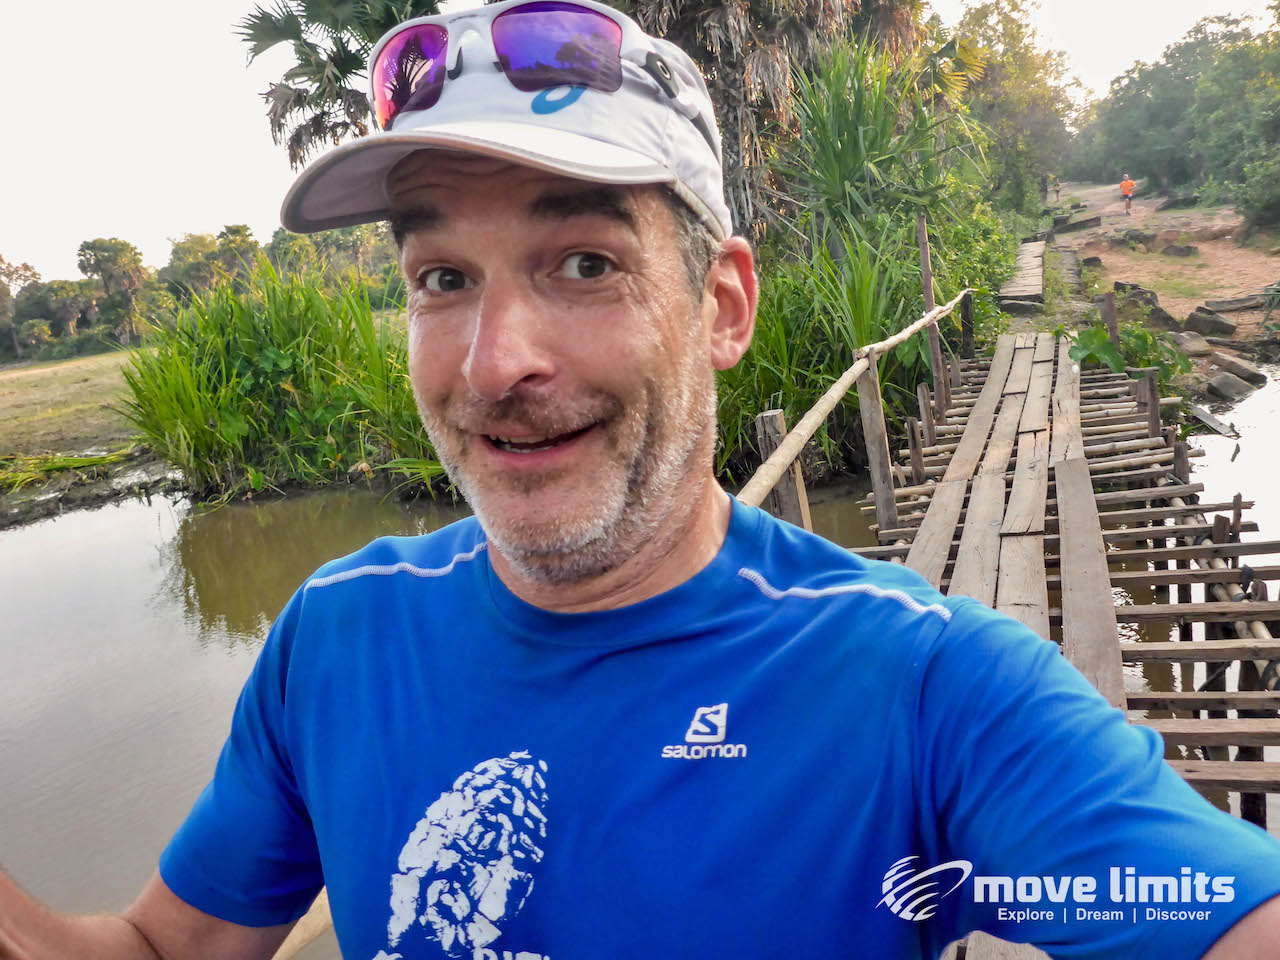 Angkor Thom und Angkor Wat - movelimits.de - Ultra Trail Angkor -auf der Strecke-movelimits.de